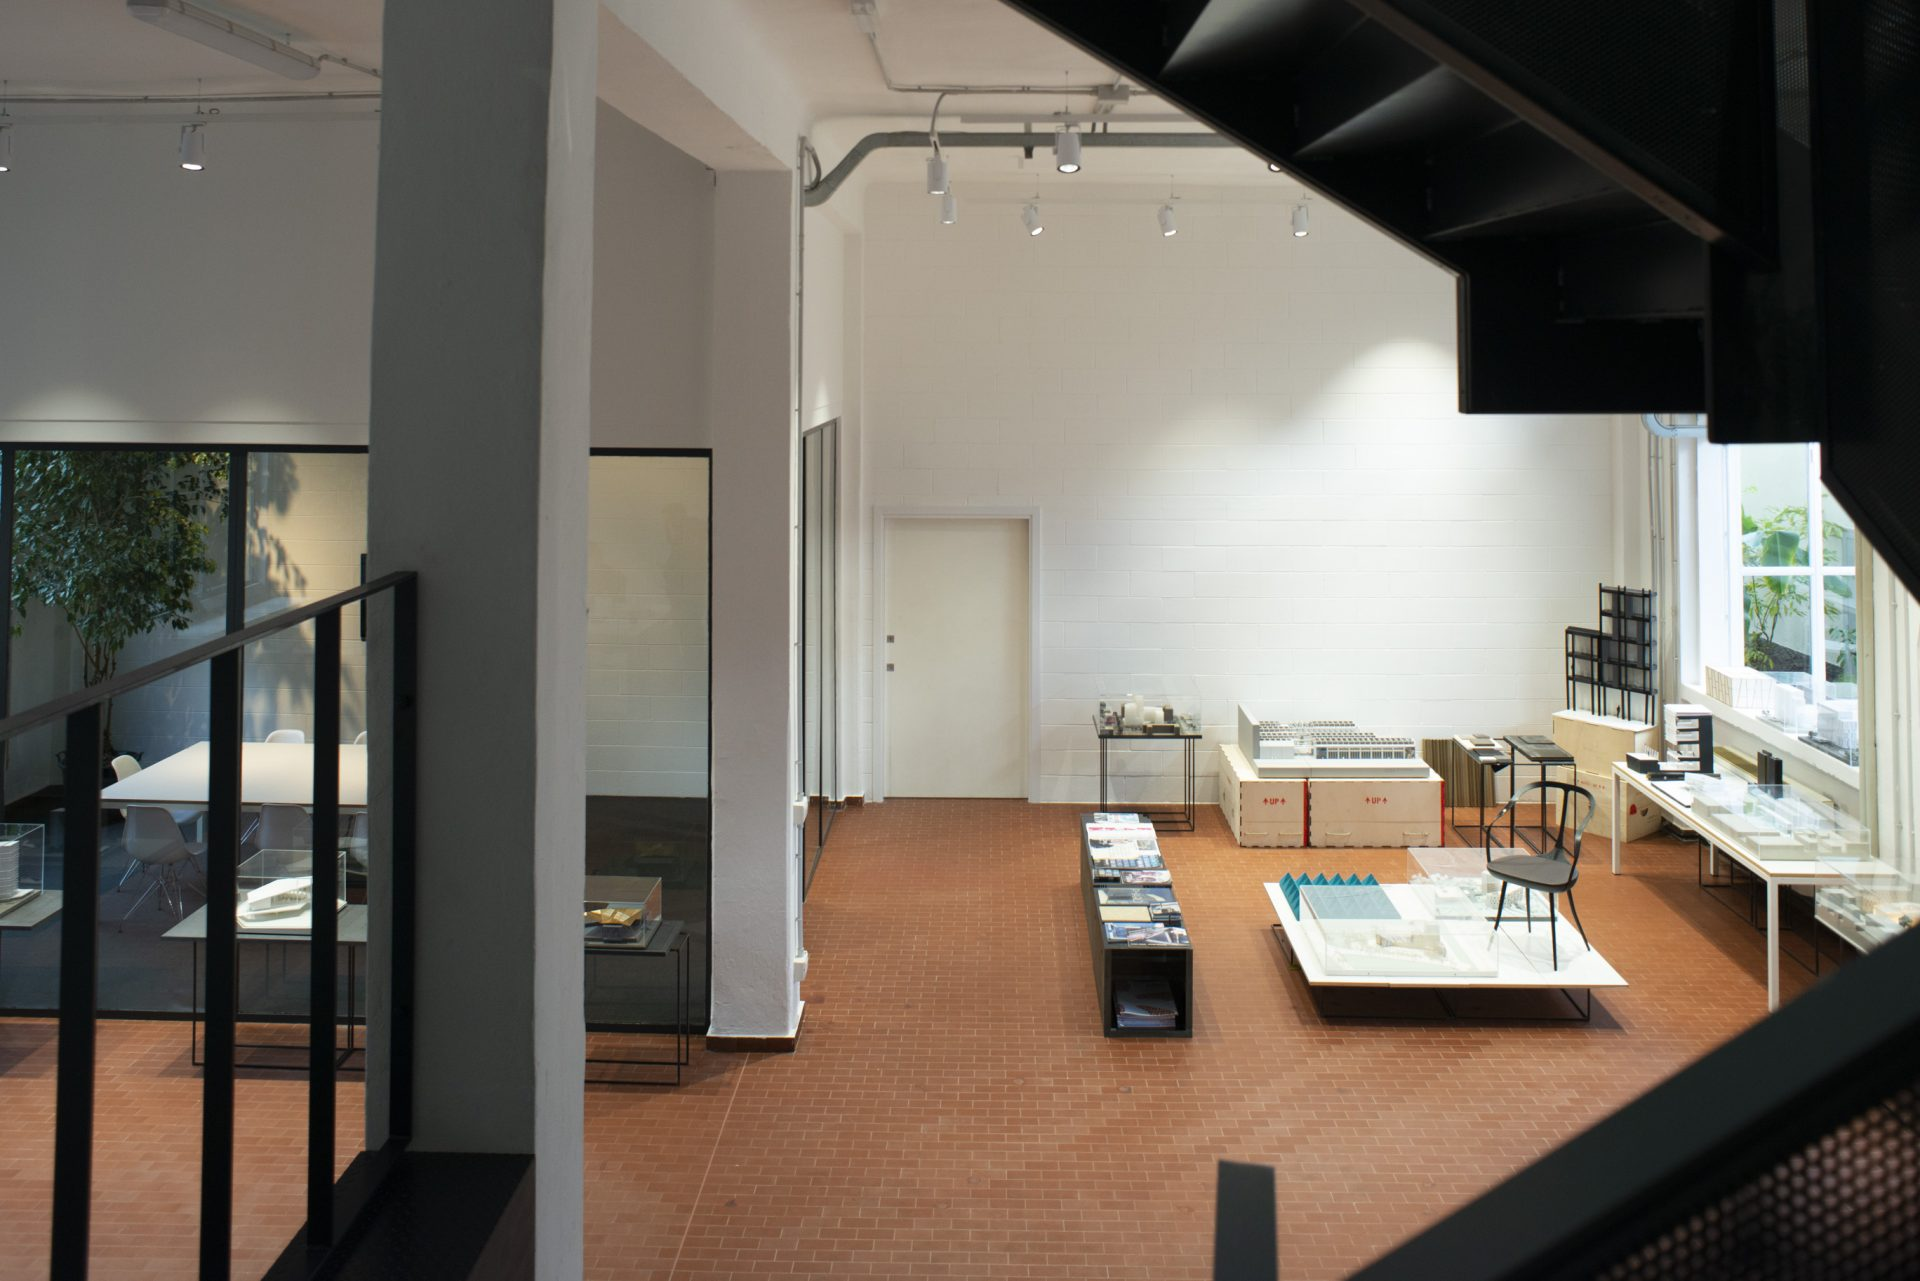 Studio Park Associati